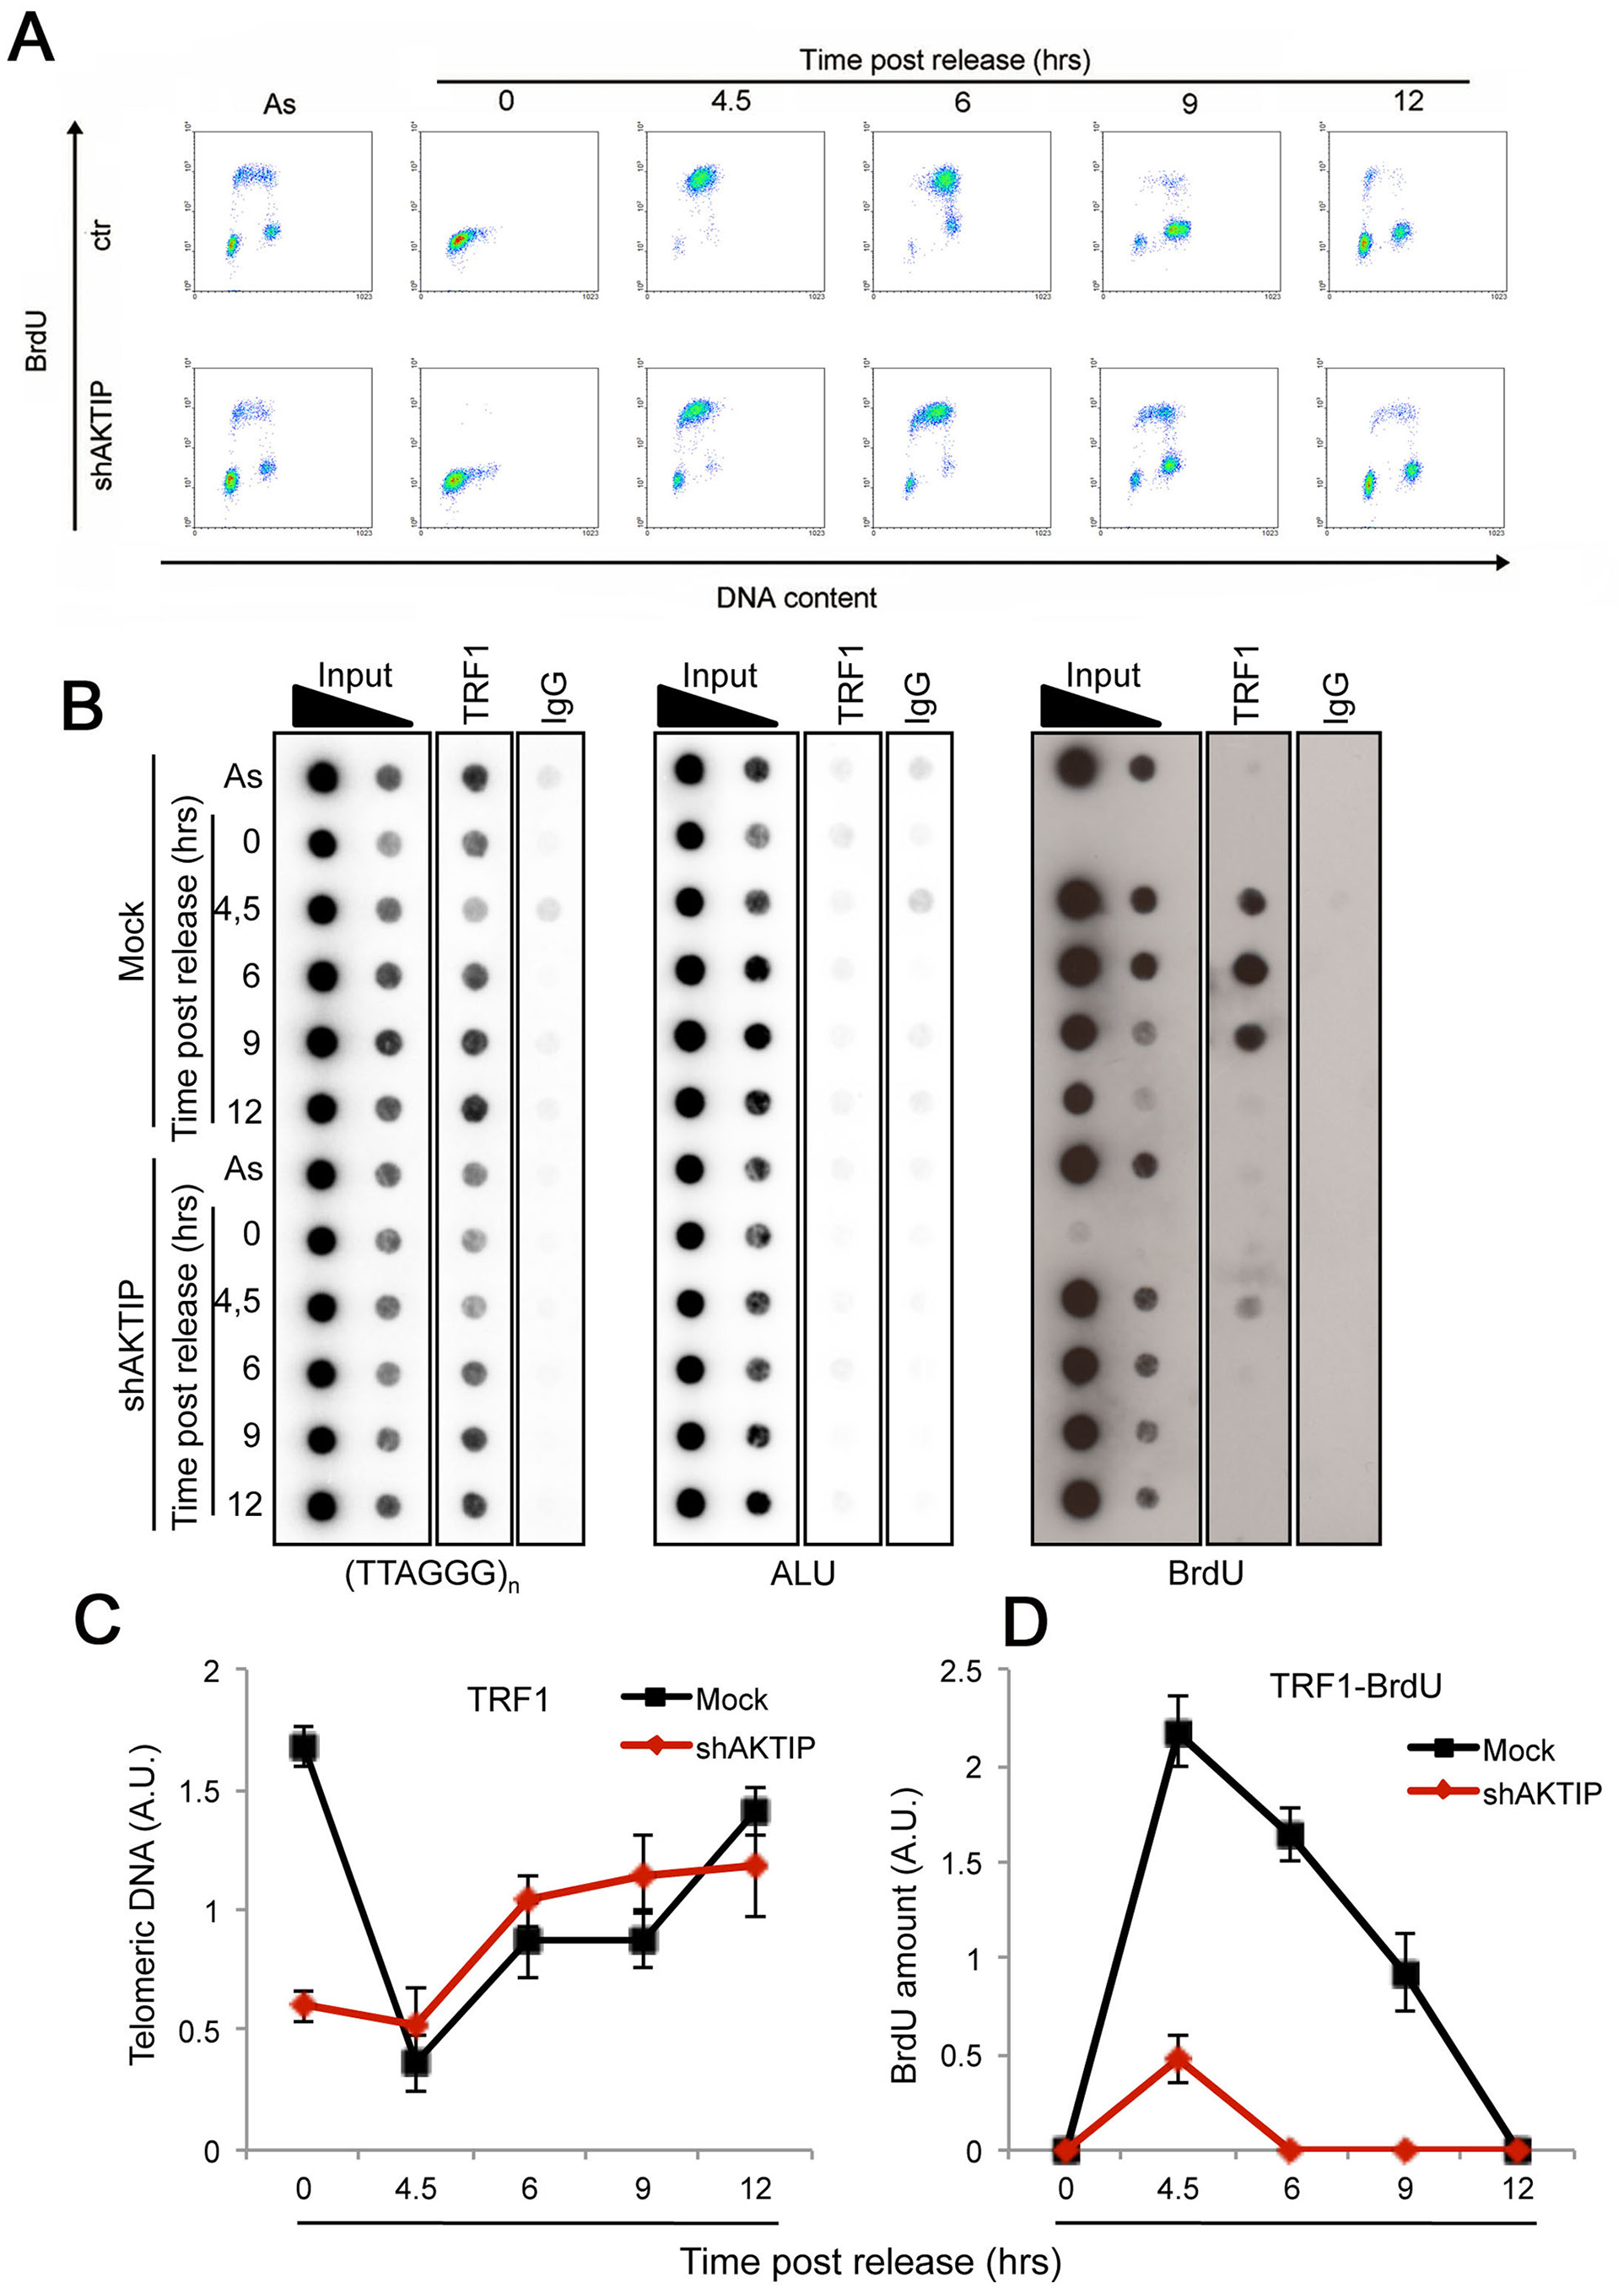 AKTIP downregulation impairs telomere replication.